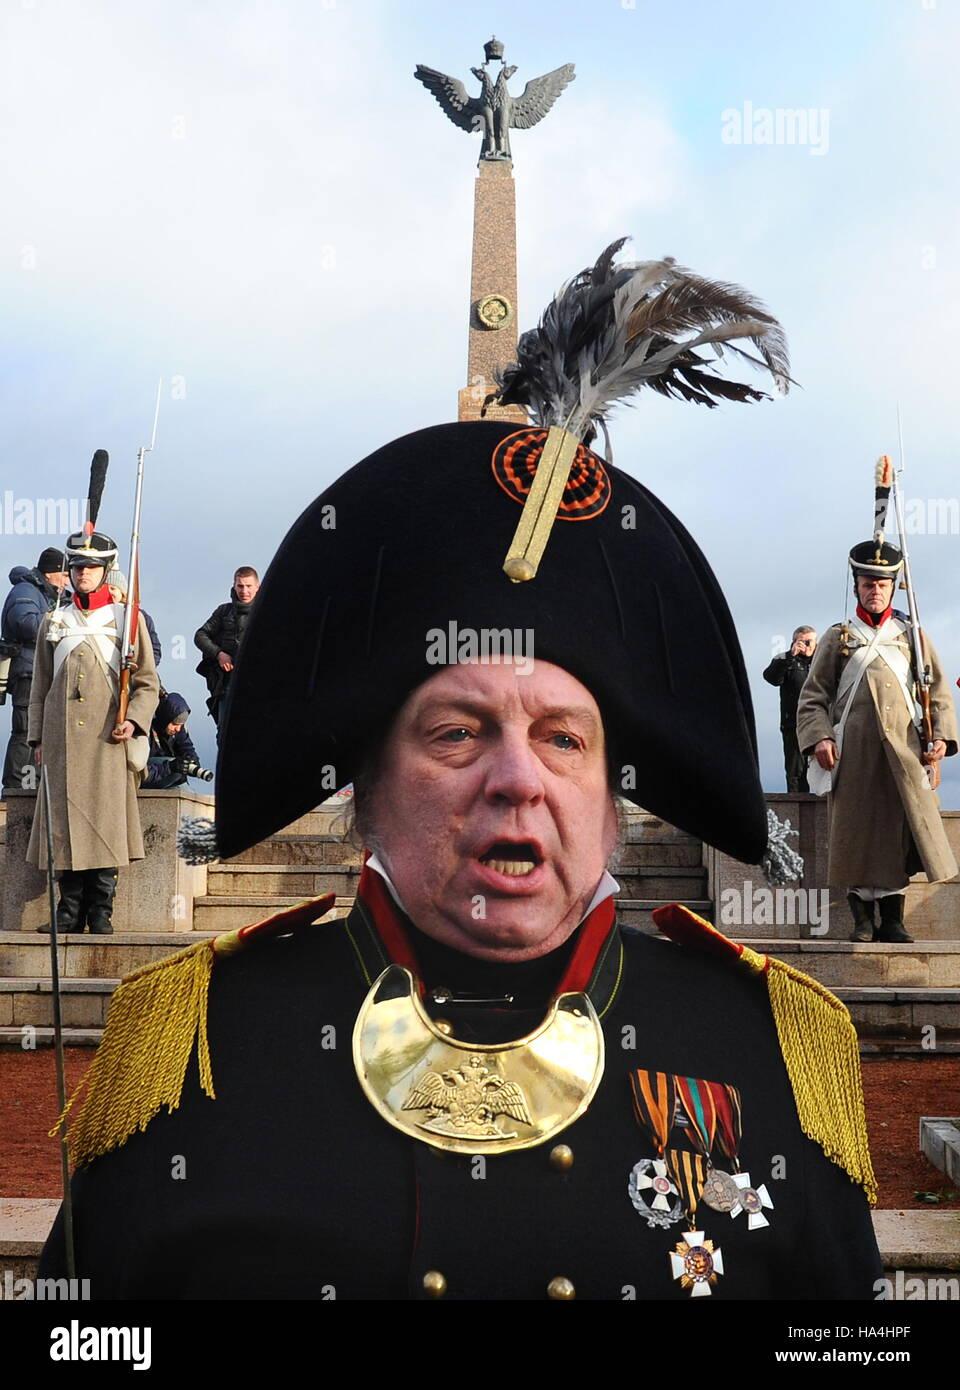 MINSK REGION, BELARUS - NOVEMBER 27, 2016: A reenactment of the 1812 Battle of the Berezina River in the village - Stock Image